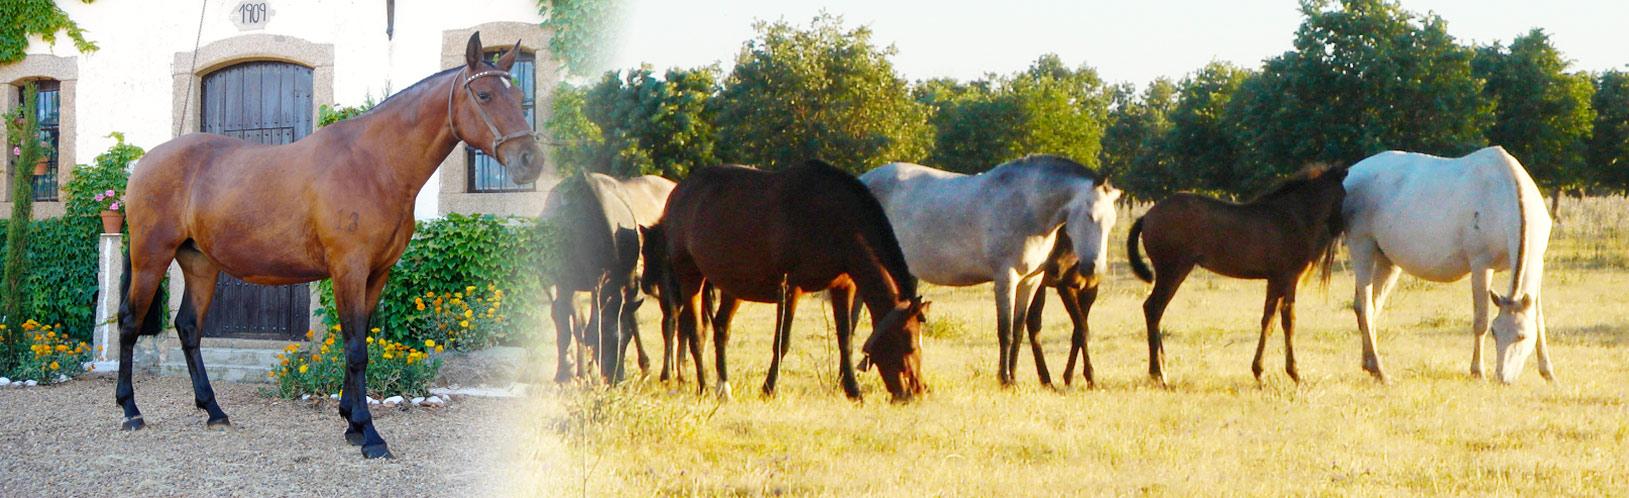 caballosslideshow